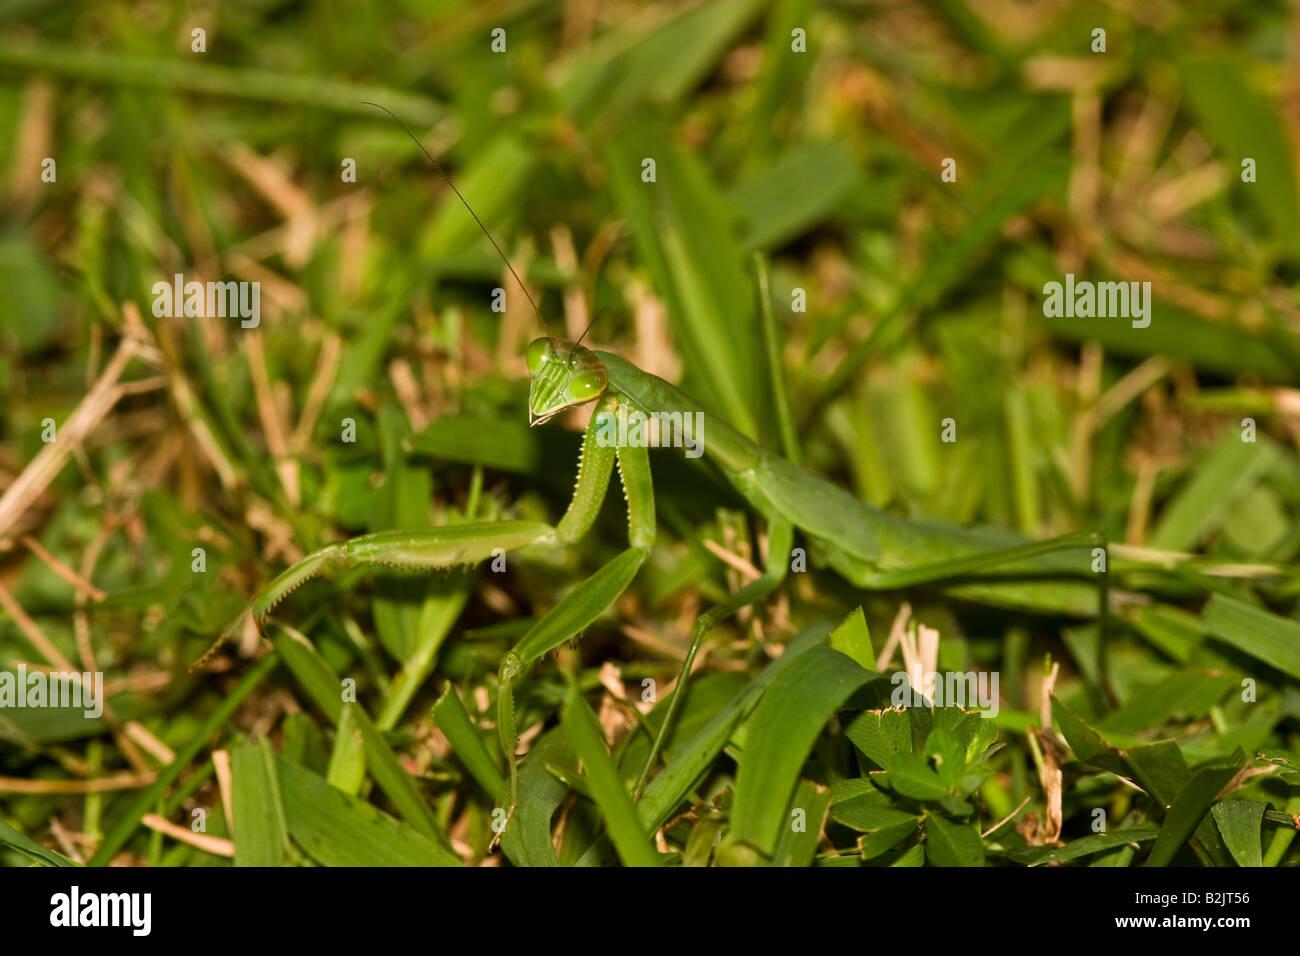 Chinese 'Preying' Mantis (Tenodera aridifolia sinensis) - Stock Image